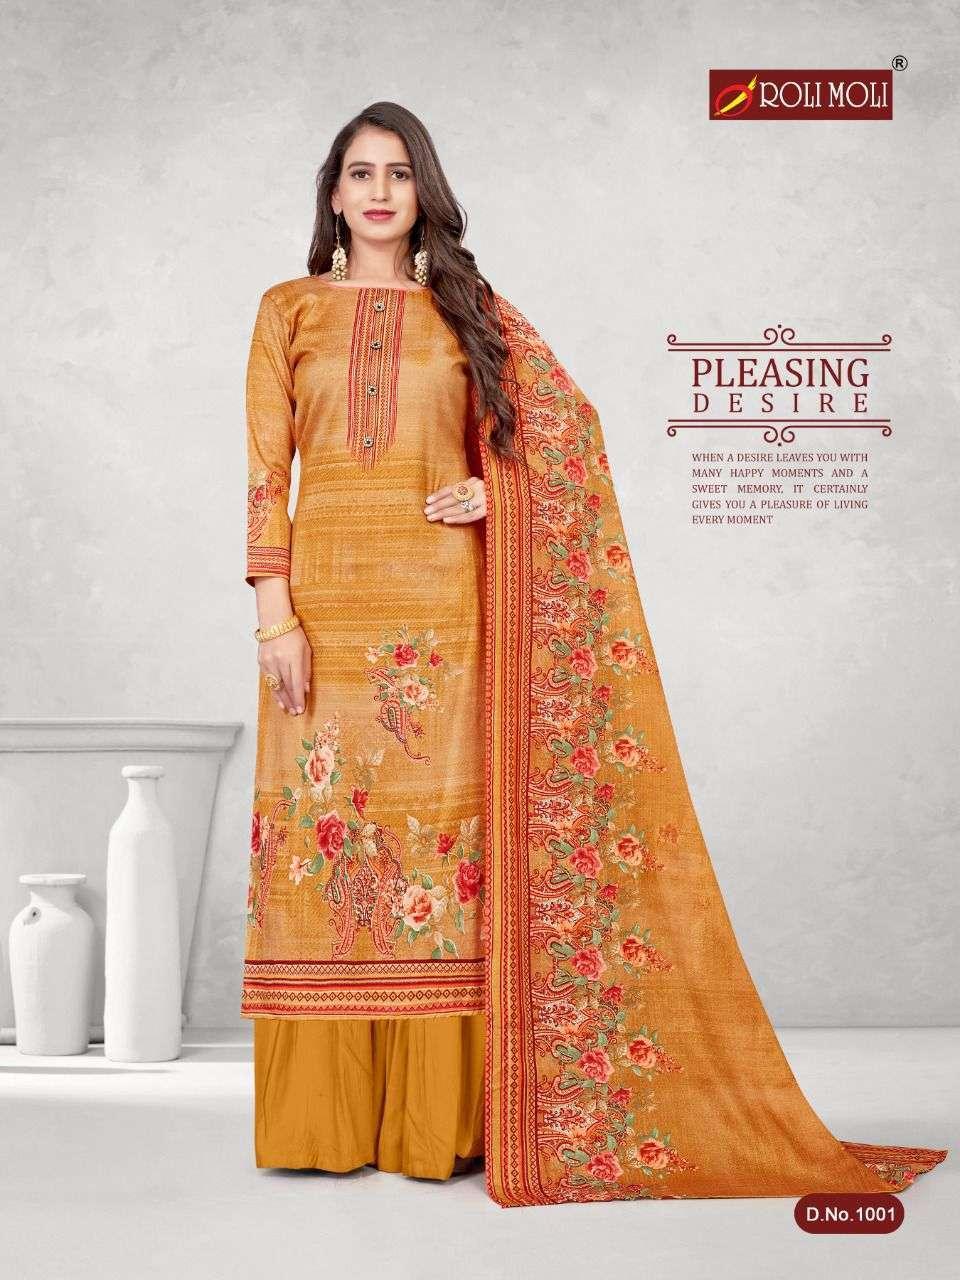 Roli Moli Kalki Pashmina Printed Dress Material Collection 01